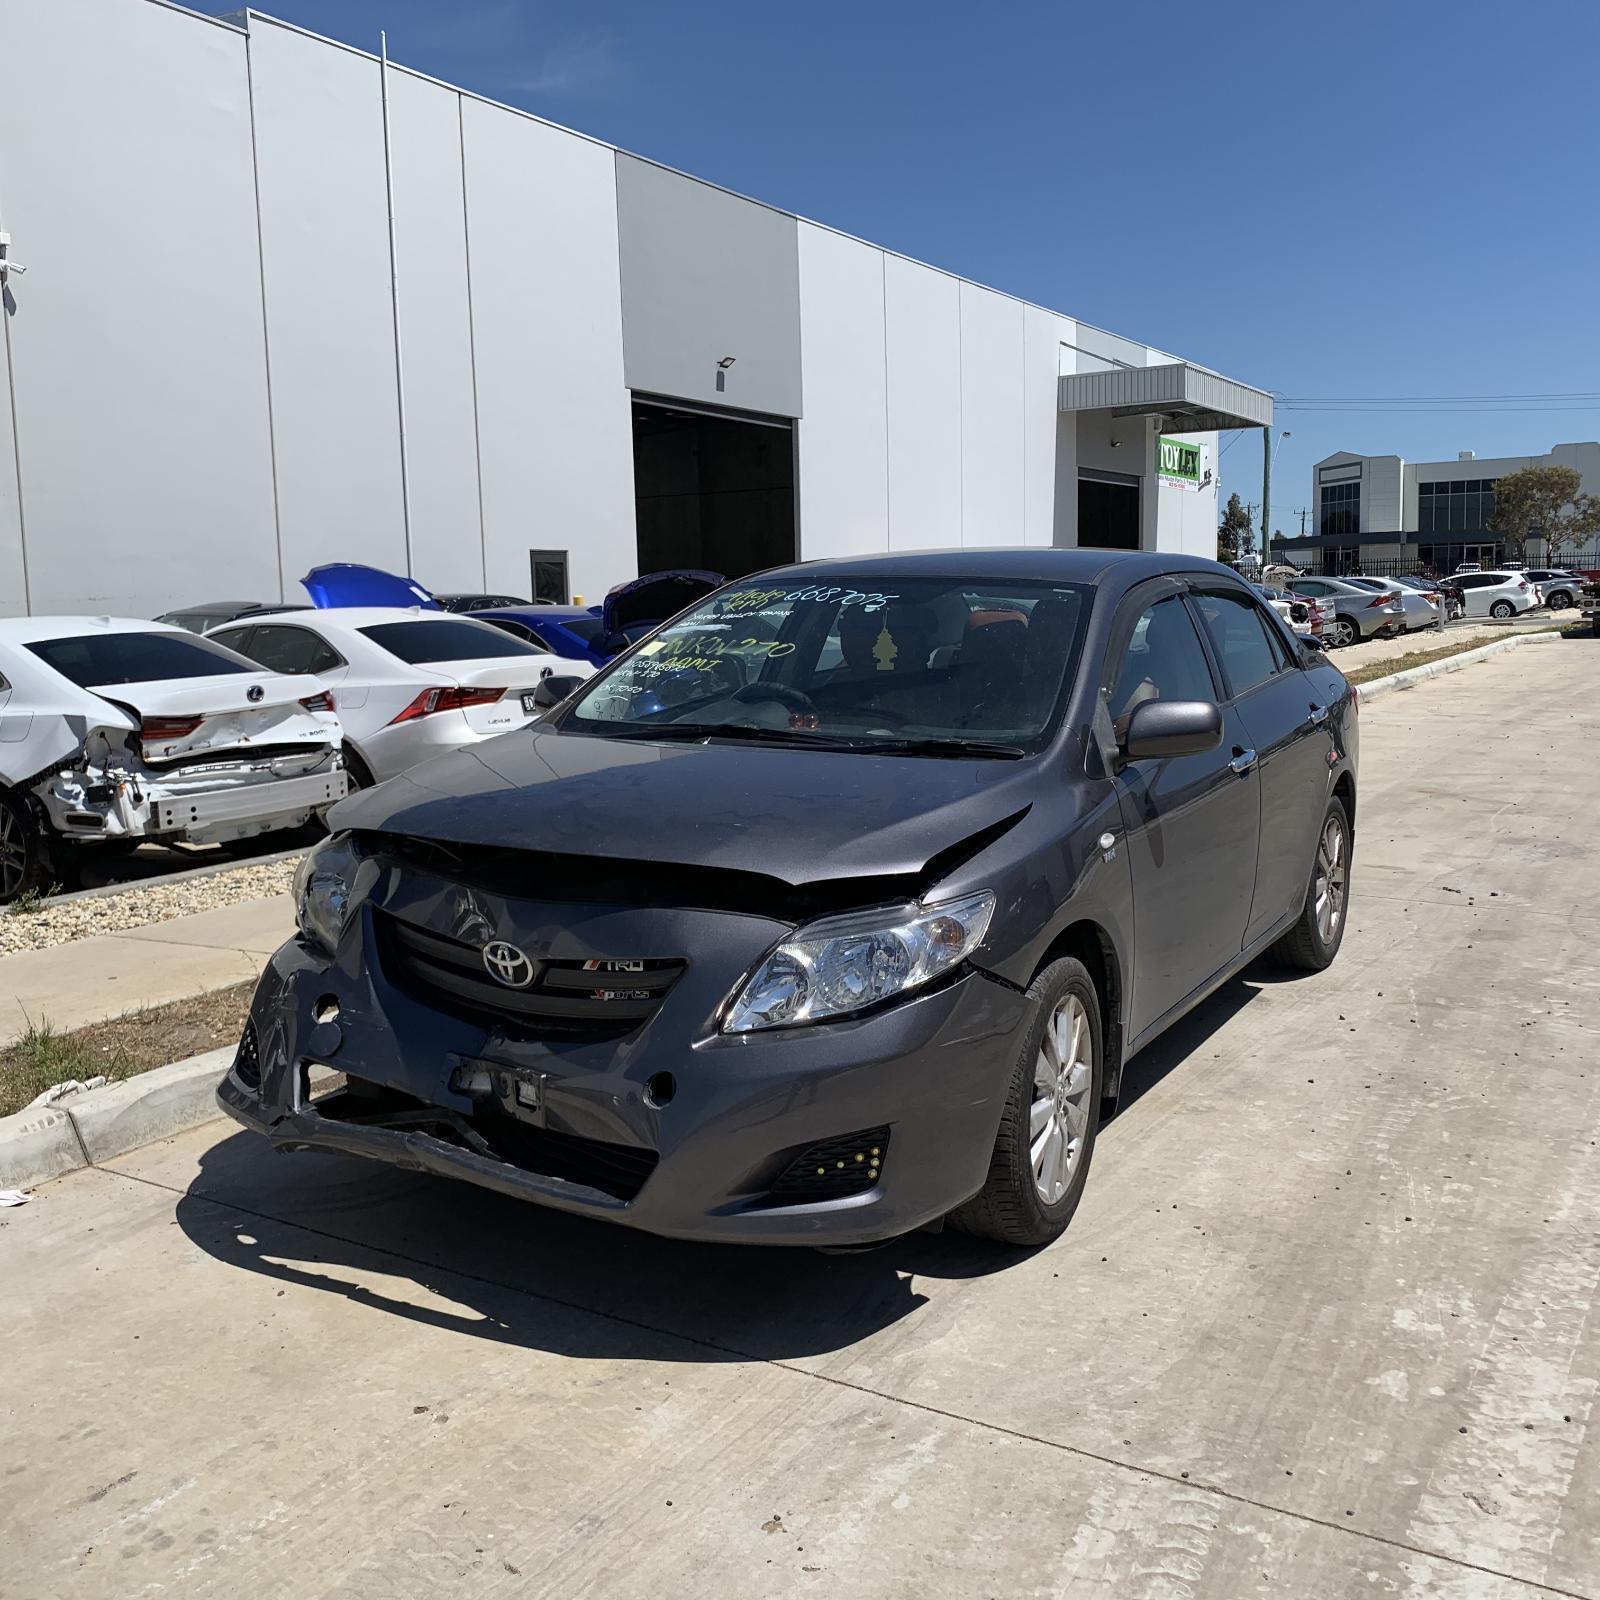 Toyota COROLLA ZRE152 ASCENT 2ZR-FE 1.8L Engine Automatic FWD Transmission 03/07 - 12/13